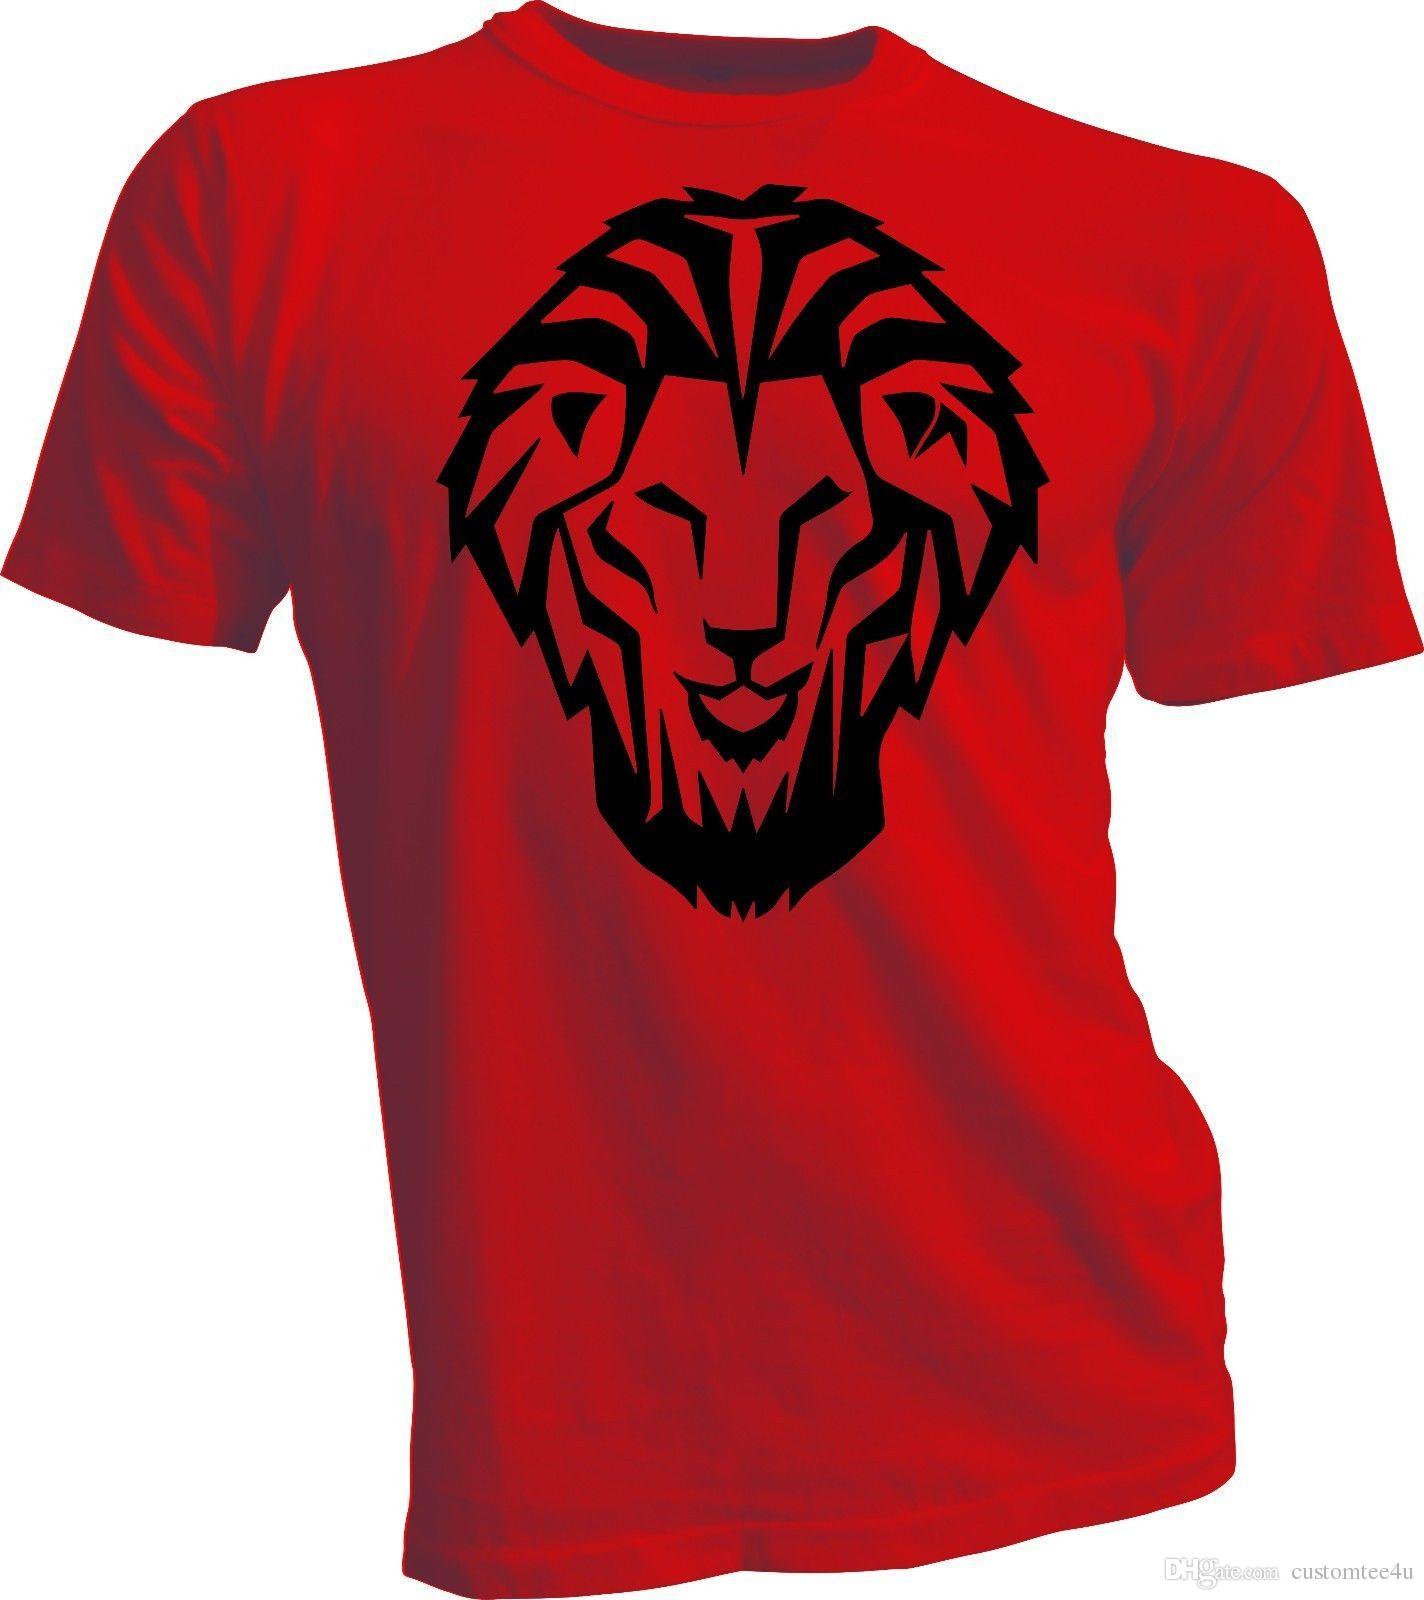 6b83976de5856 Compre Athletic Bilbao España San Mames España Fútbol Fútbol Camiseta  Camiseta Camiseta Unisex Camiseta Hombre Hombre Verano Manga Corta Algodón  ...